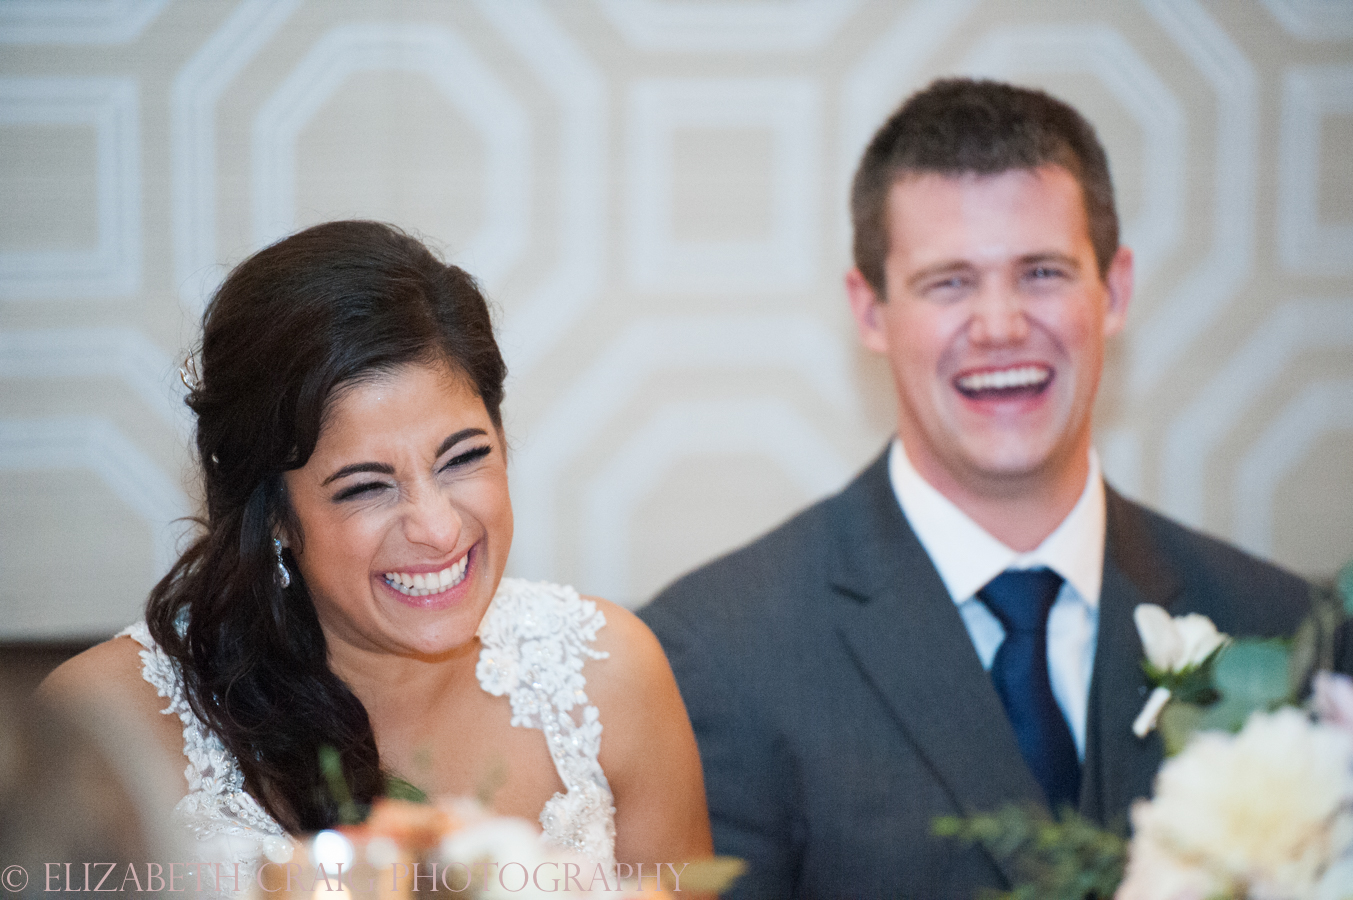 pittsburgh-greek-weddings-fairmont-weddings-receptions-elizabeth-craig-photohgraphy-025